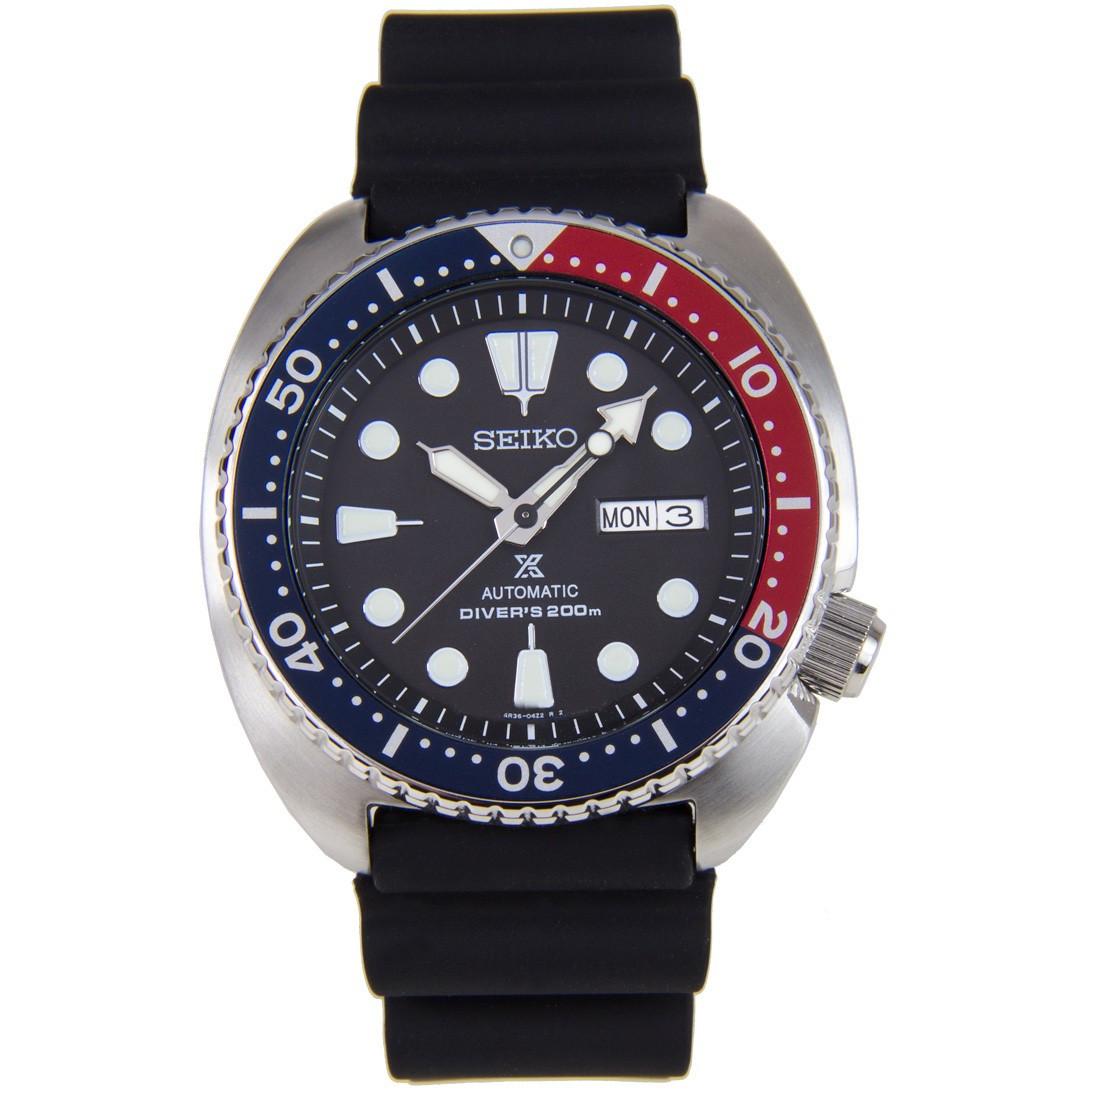 Часы Seiko Prospex SRP779J1 Turtle Automatic Diver's 4R36